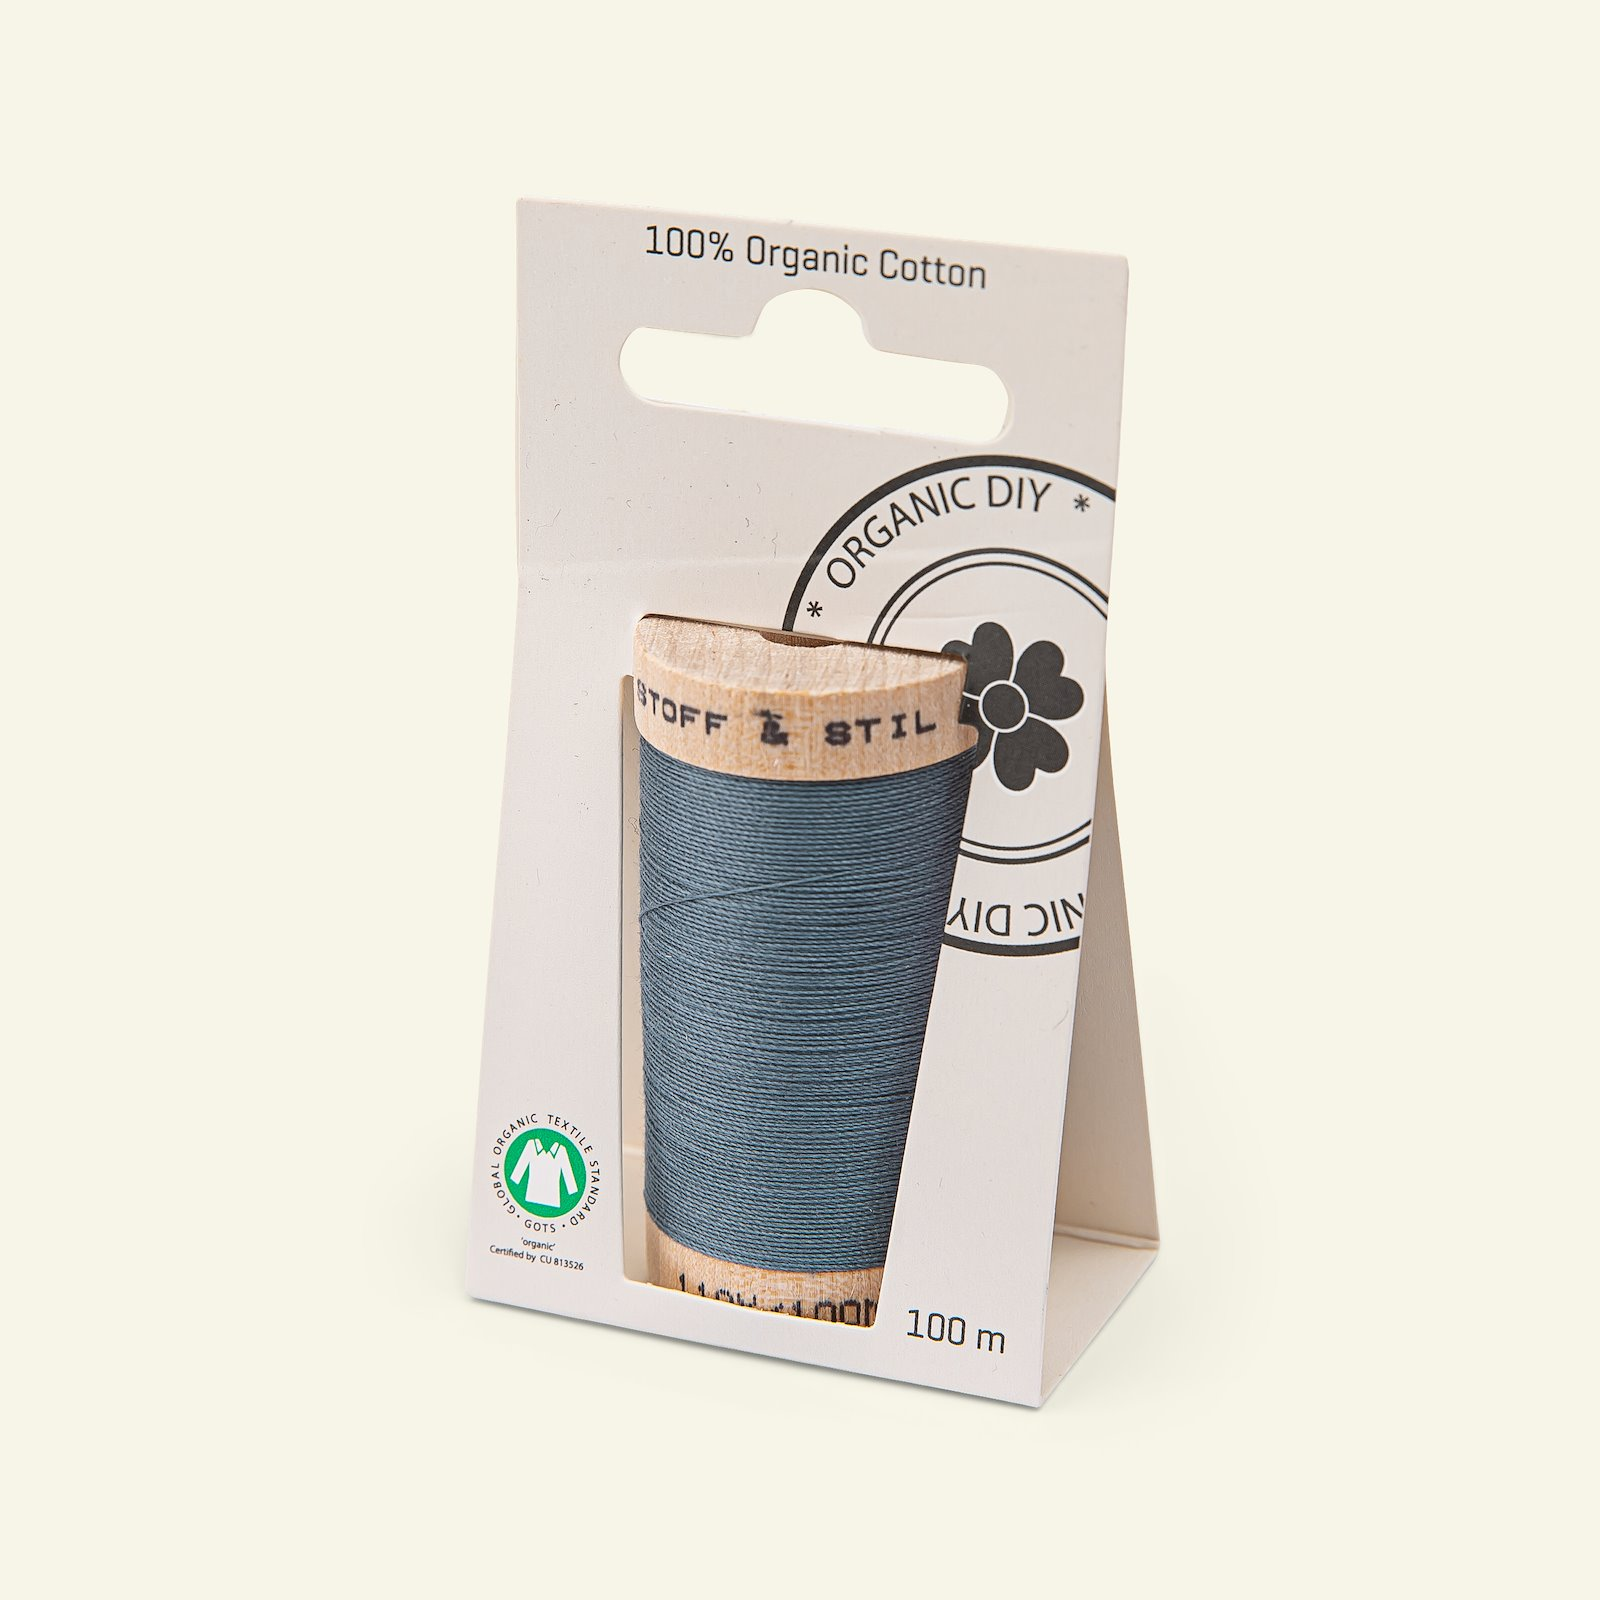 Sewing thread organic cotton blue 100m 18021_pack_b